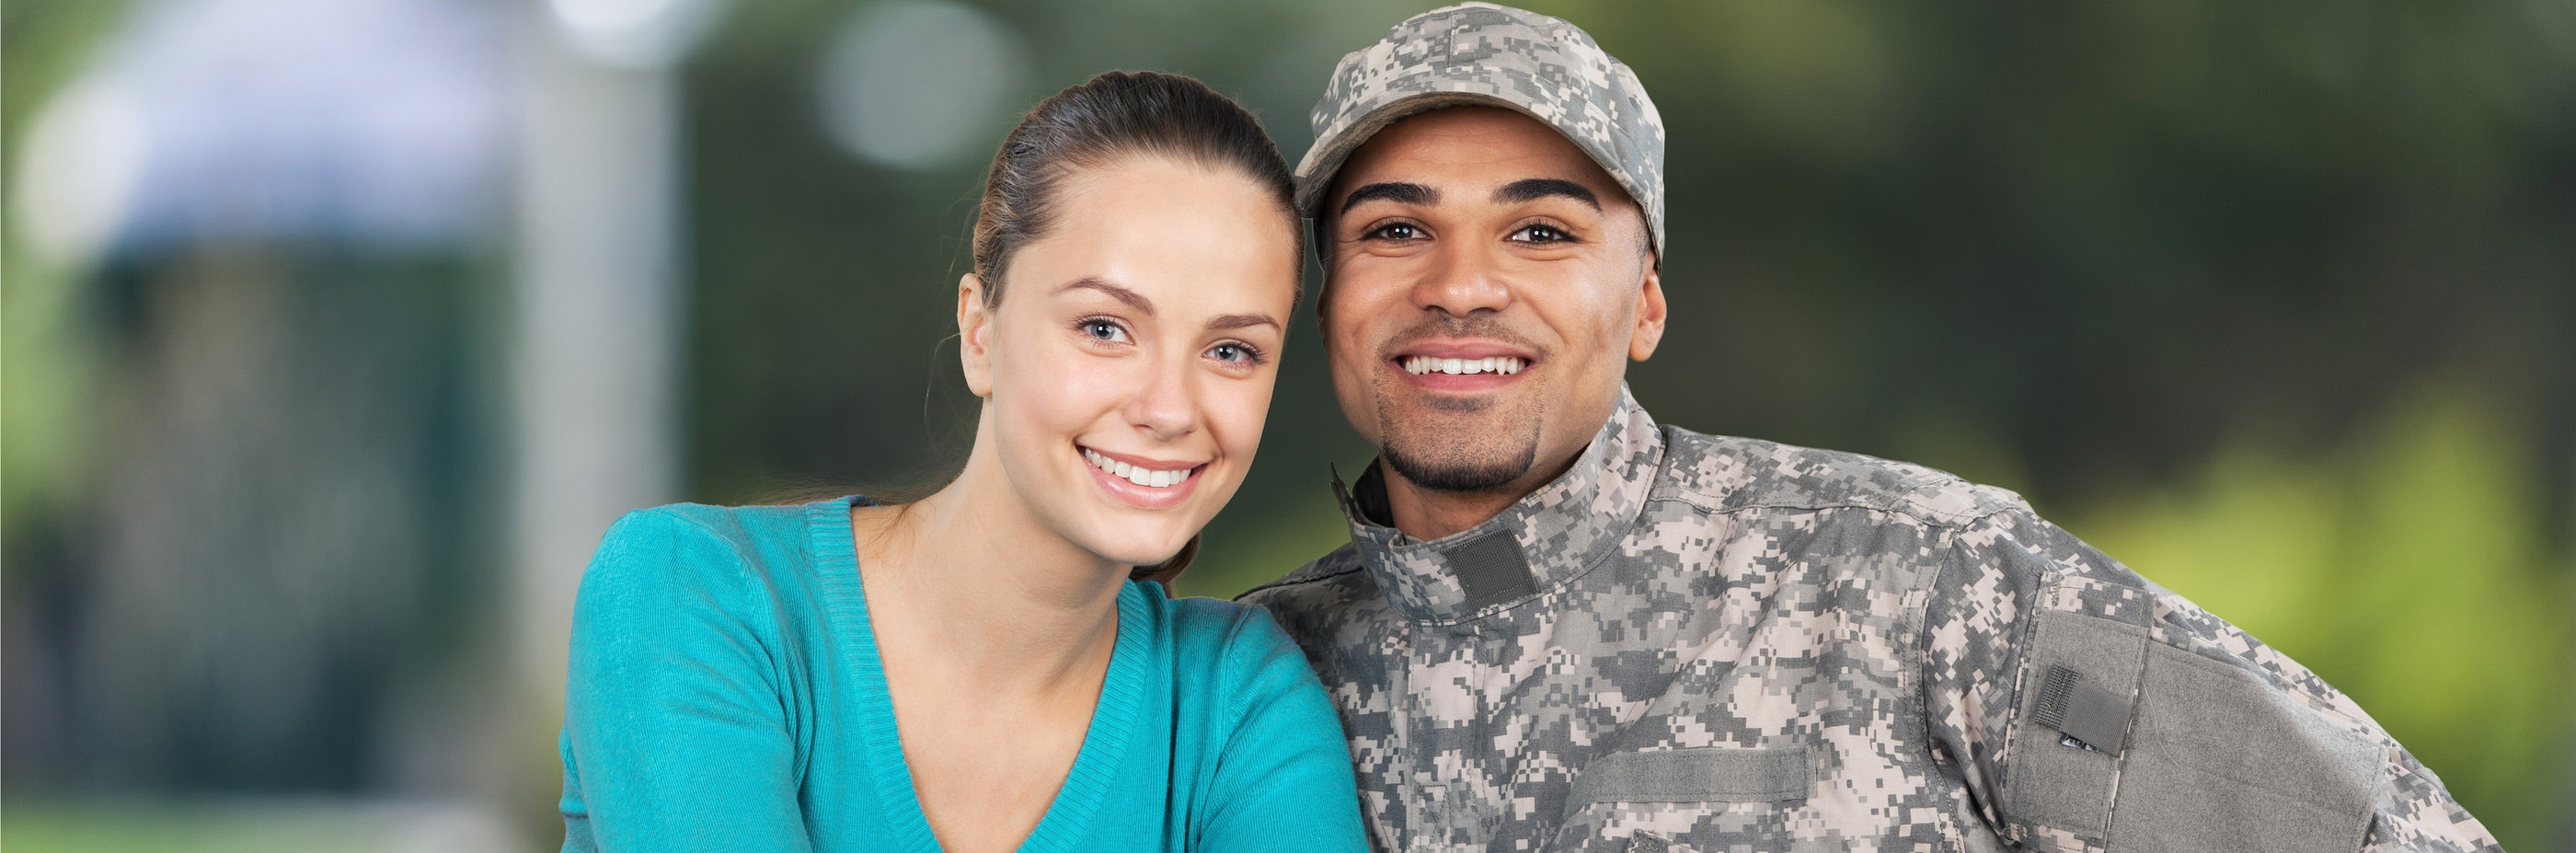 veteran couple